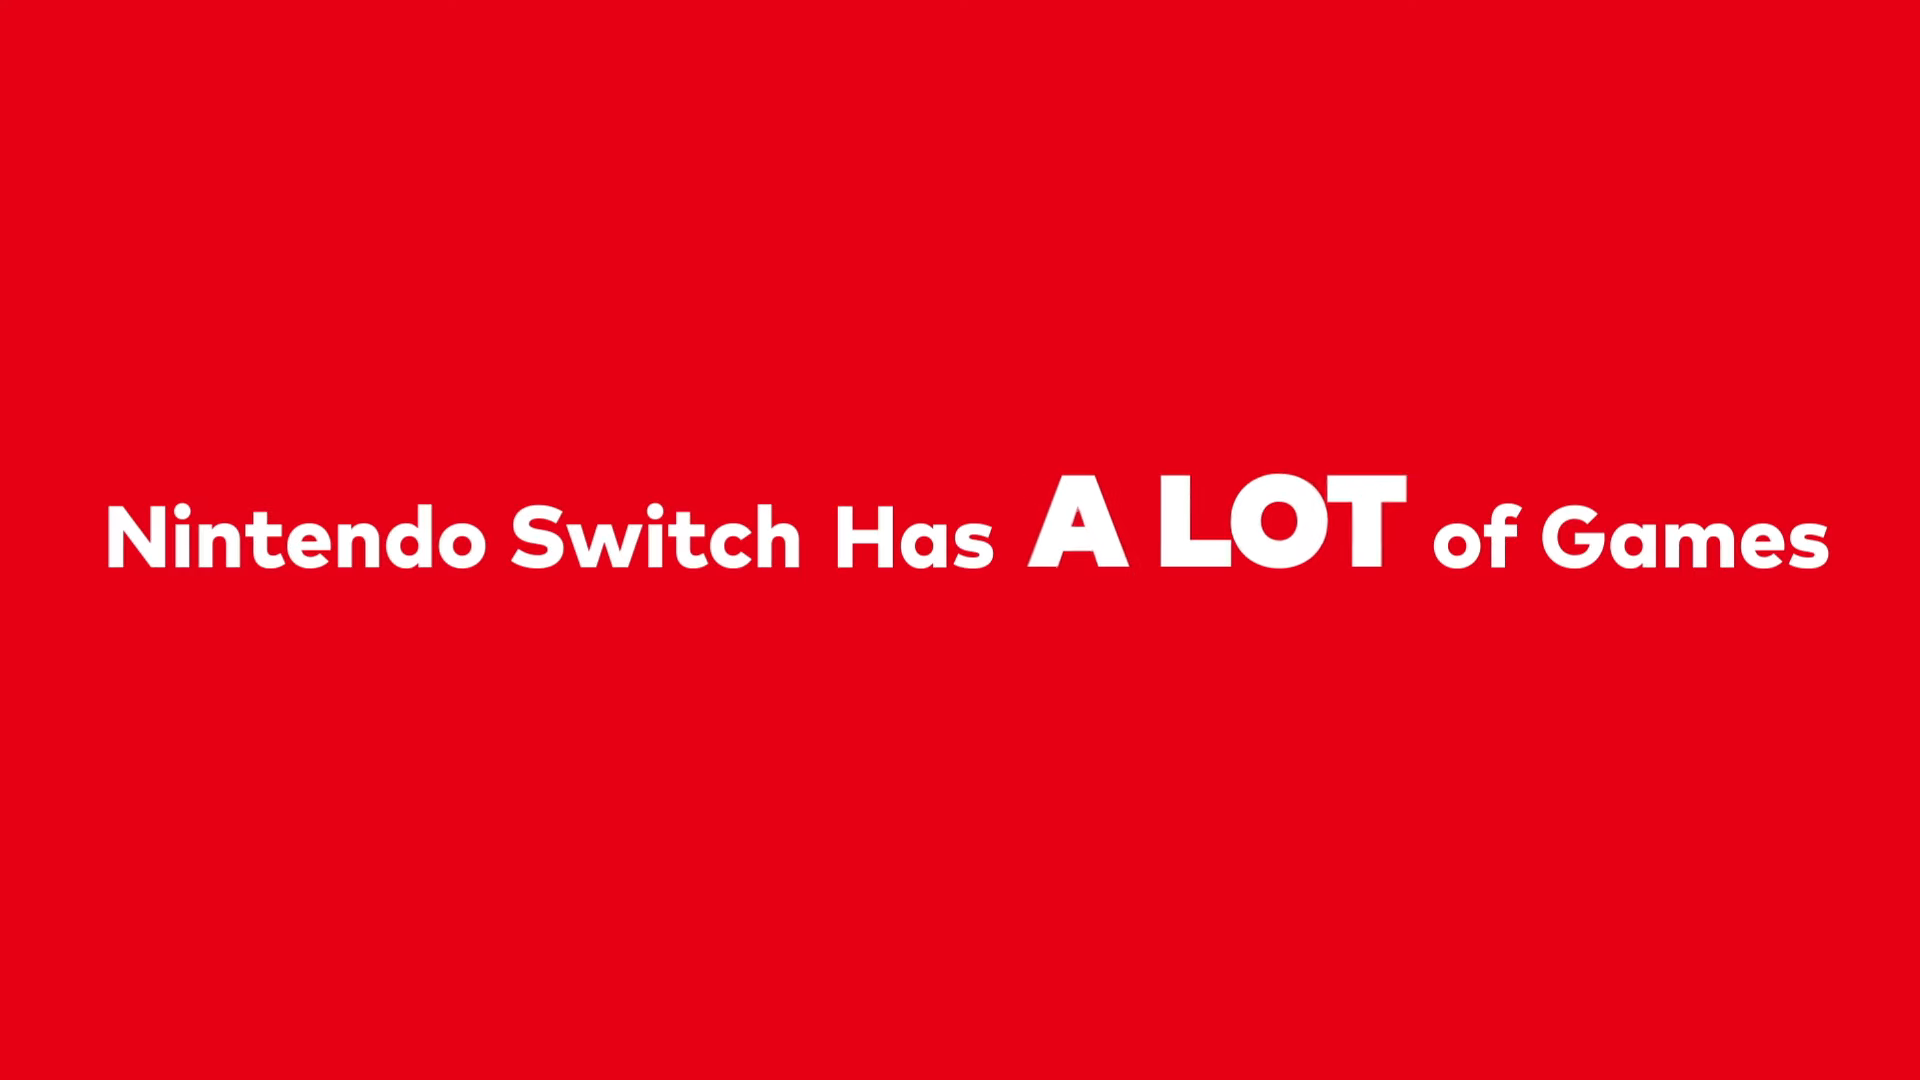 QhD3r8K - 任天堂「Nintendo Switchには2480本以上のゲームタイトルがある!」